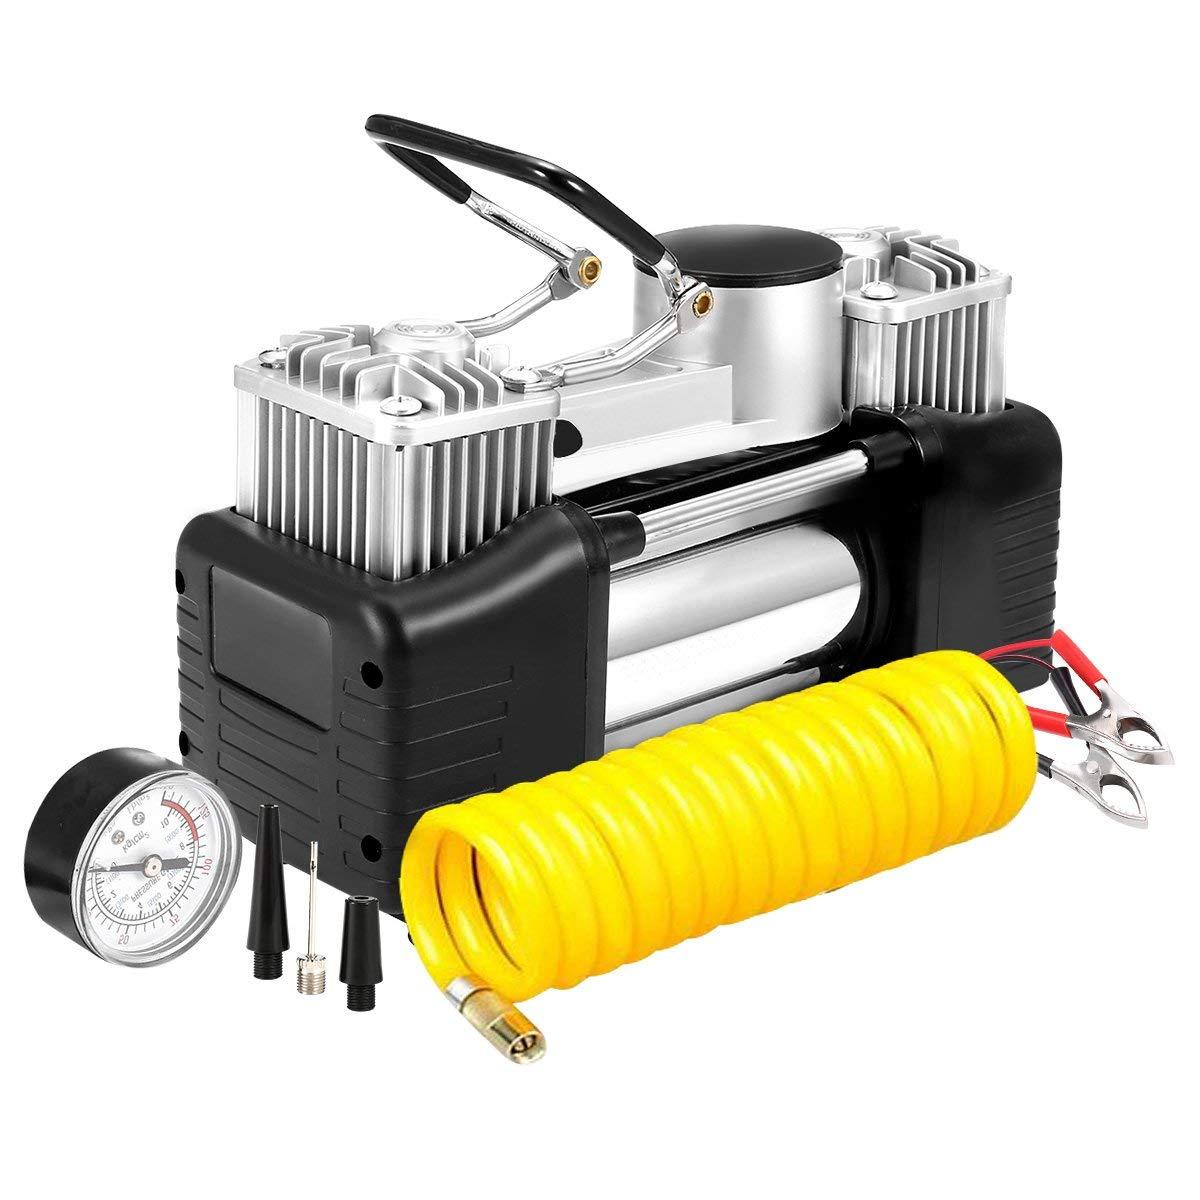 AUDEW Portable Air Compressor, Dual Cylinder Air Pump, 12V Tire Inflator $40.59 @Amazon +FS